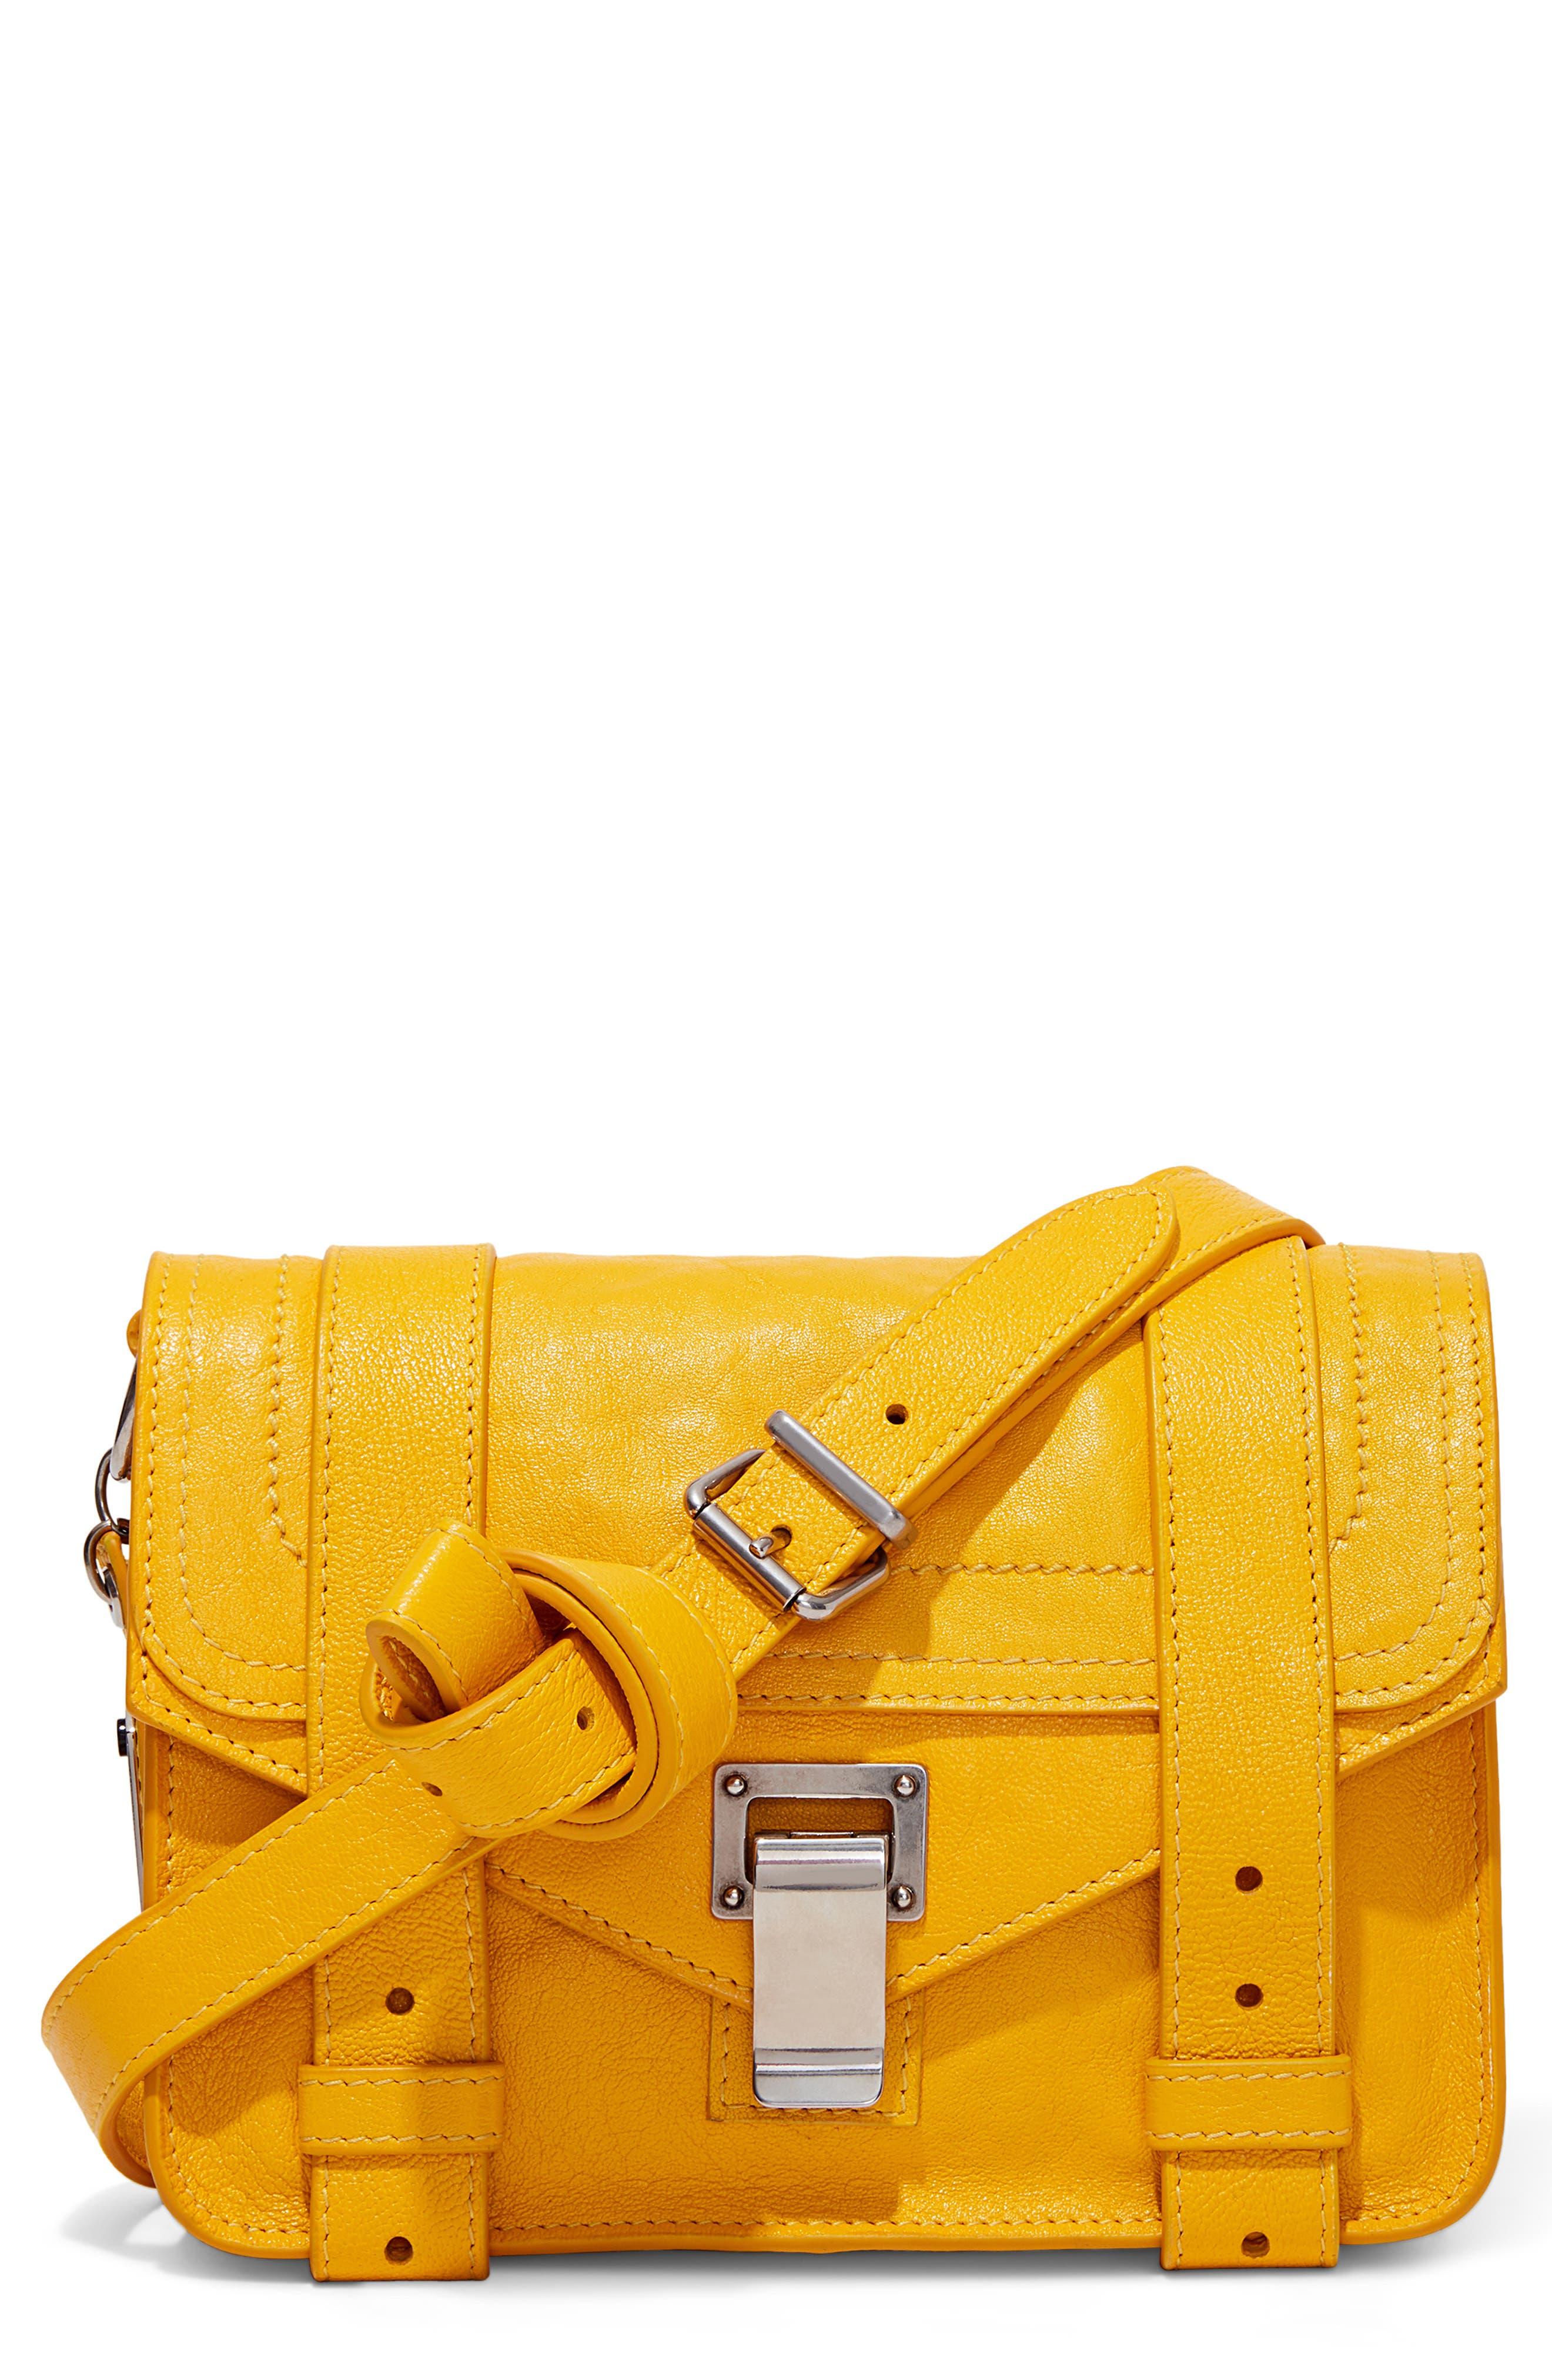 PROENZA SCHOULER 'Mini PS1' Lambskin Leather Crossbody Bag, Main, color, LEMON CHROME